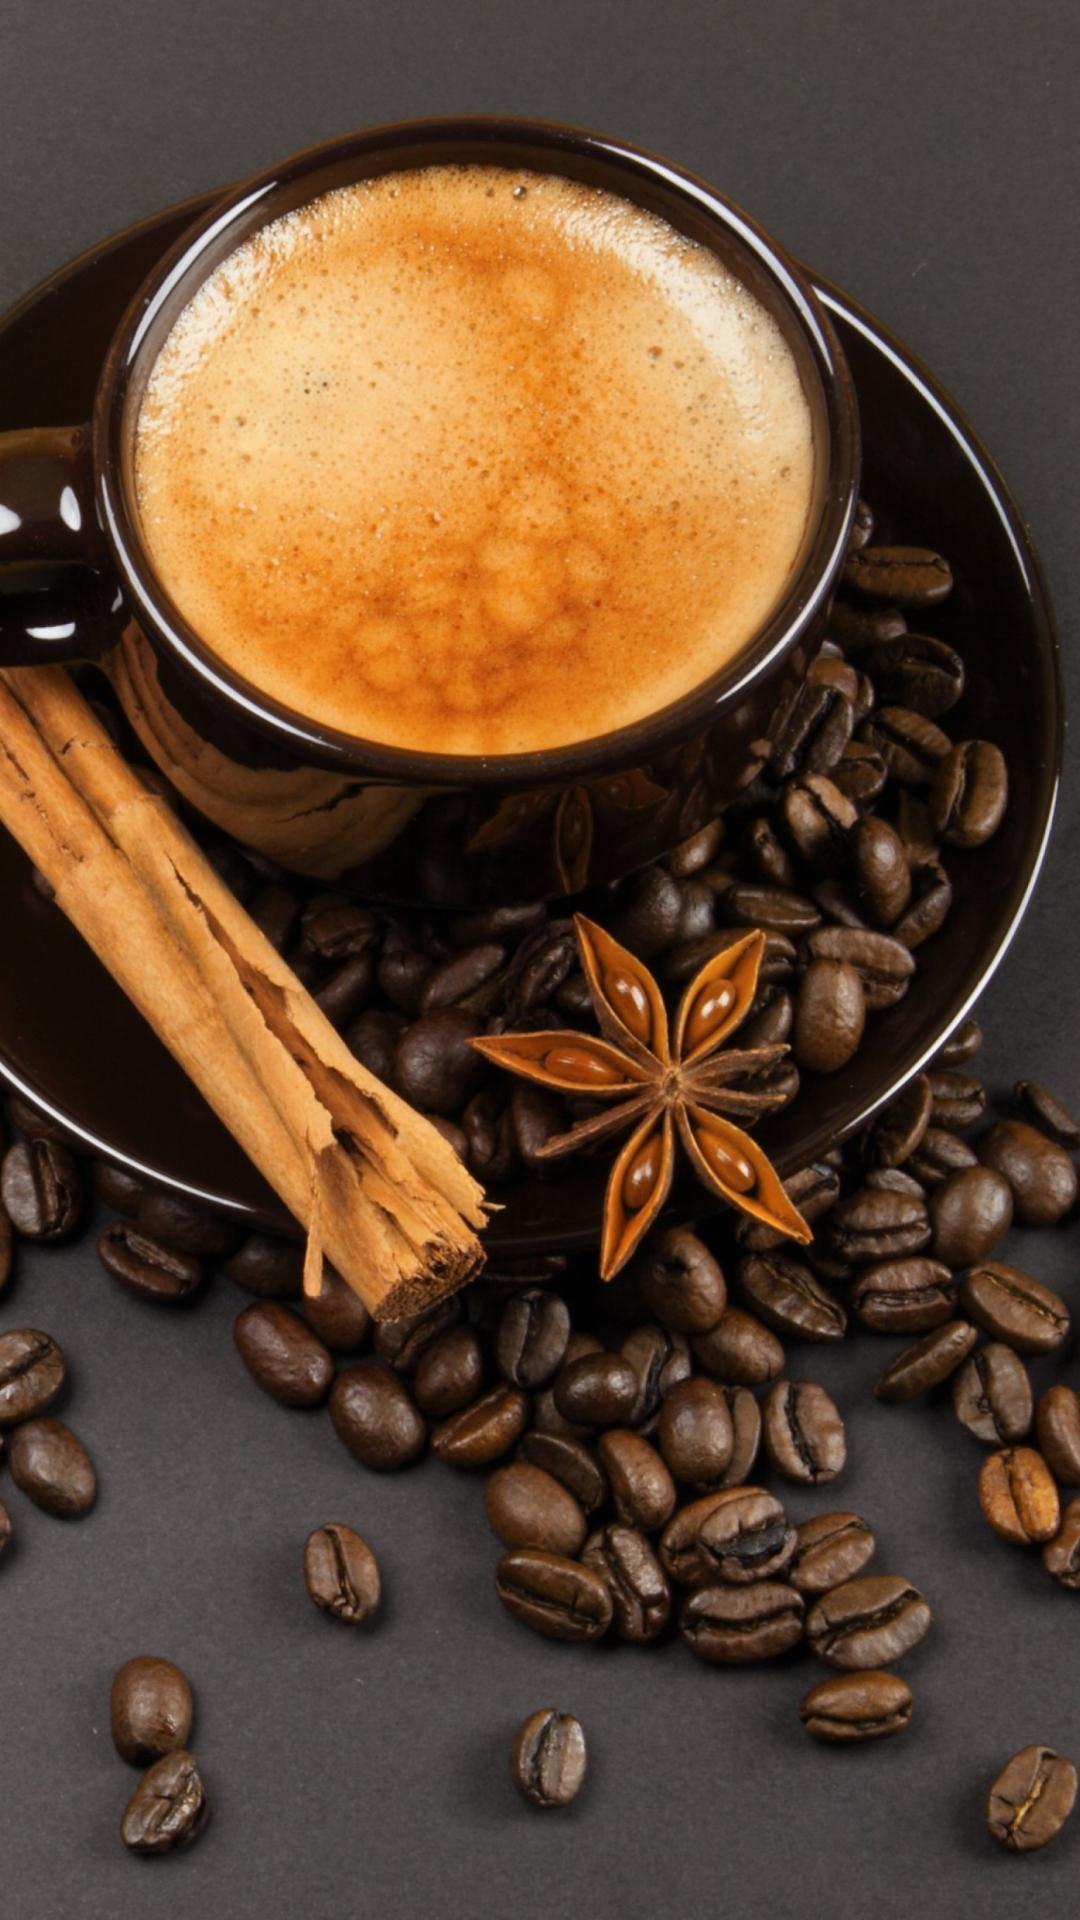 Кофе картинки на айфон